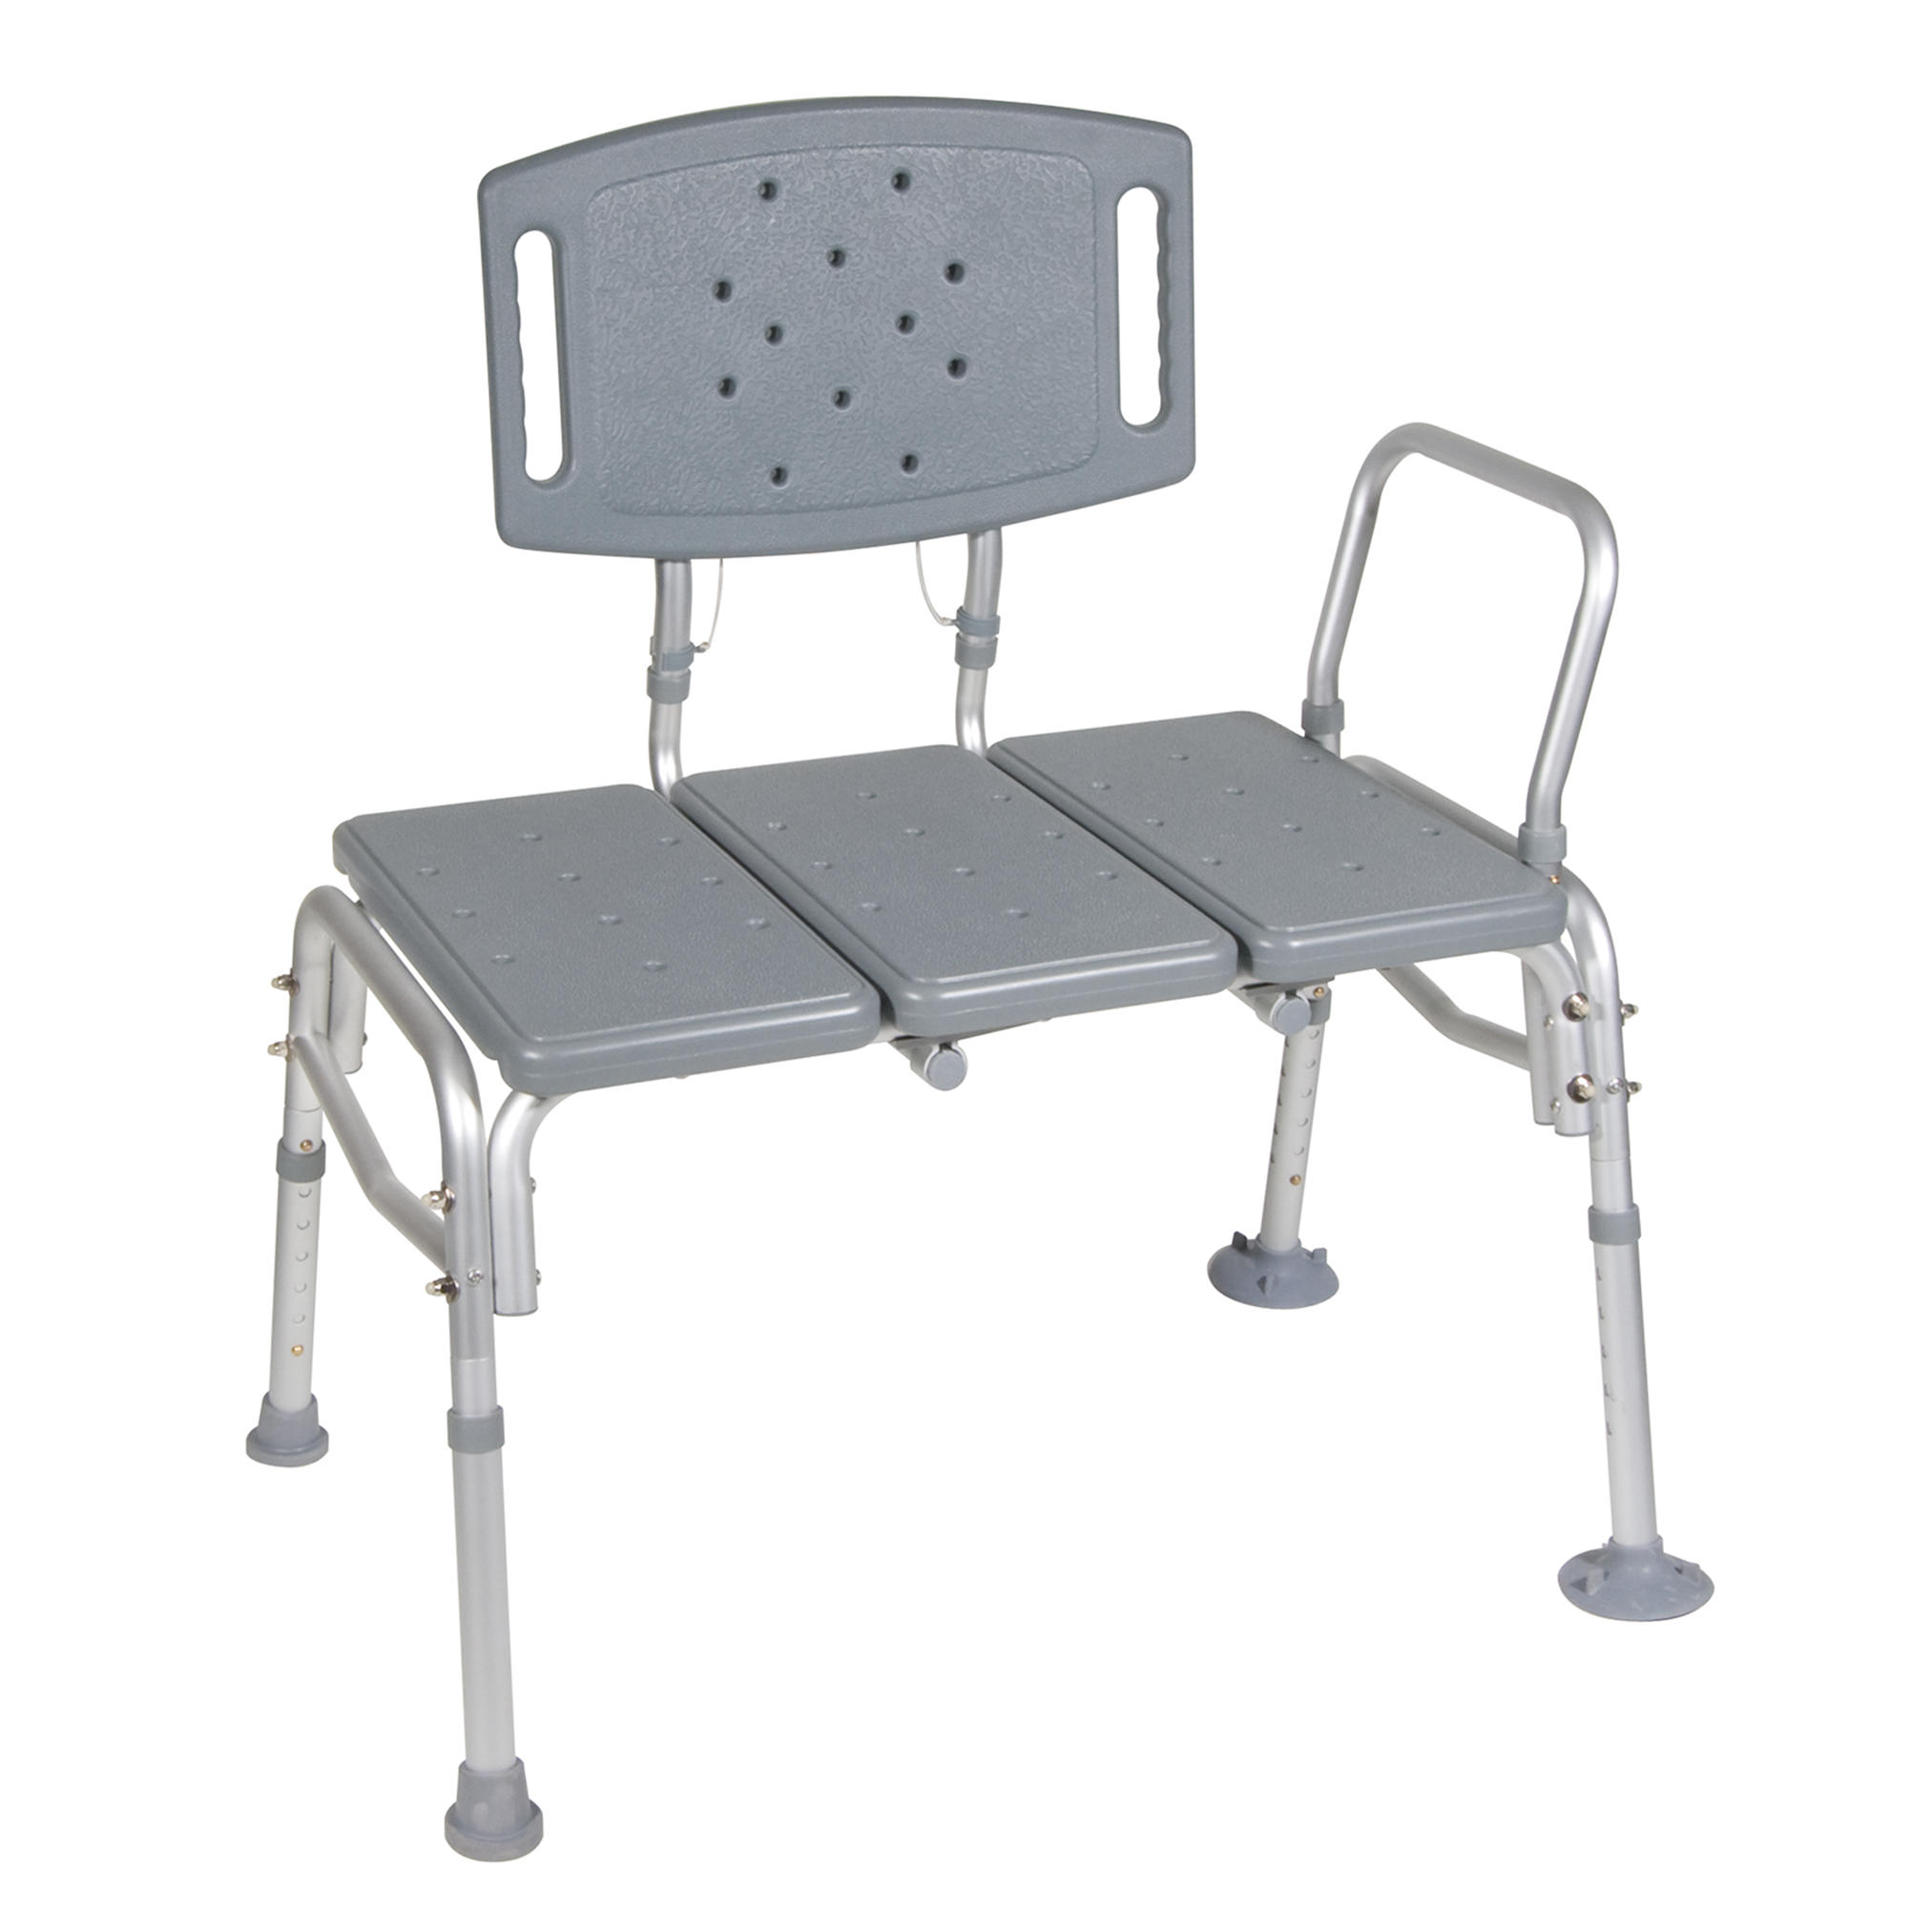 drive medical heavy duty bariatric plastic seat transfer bench